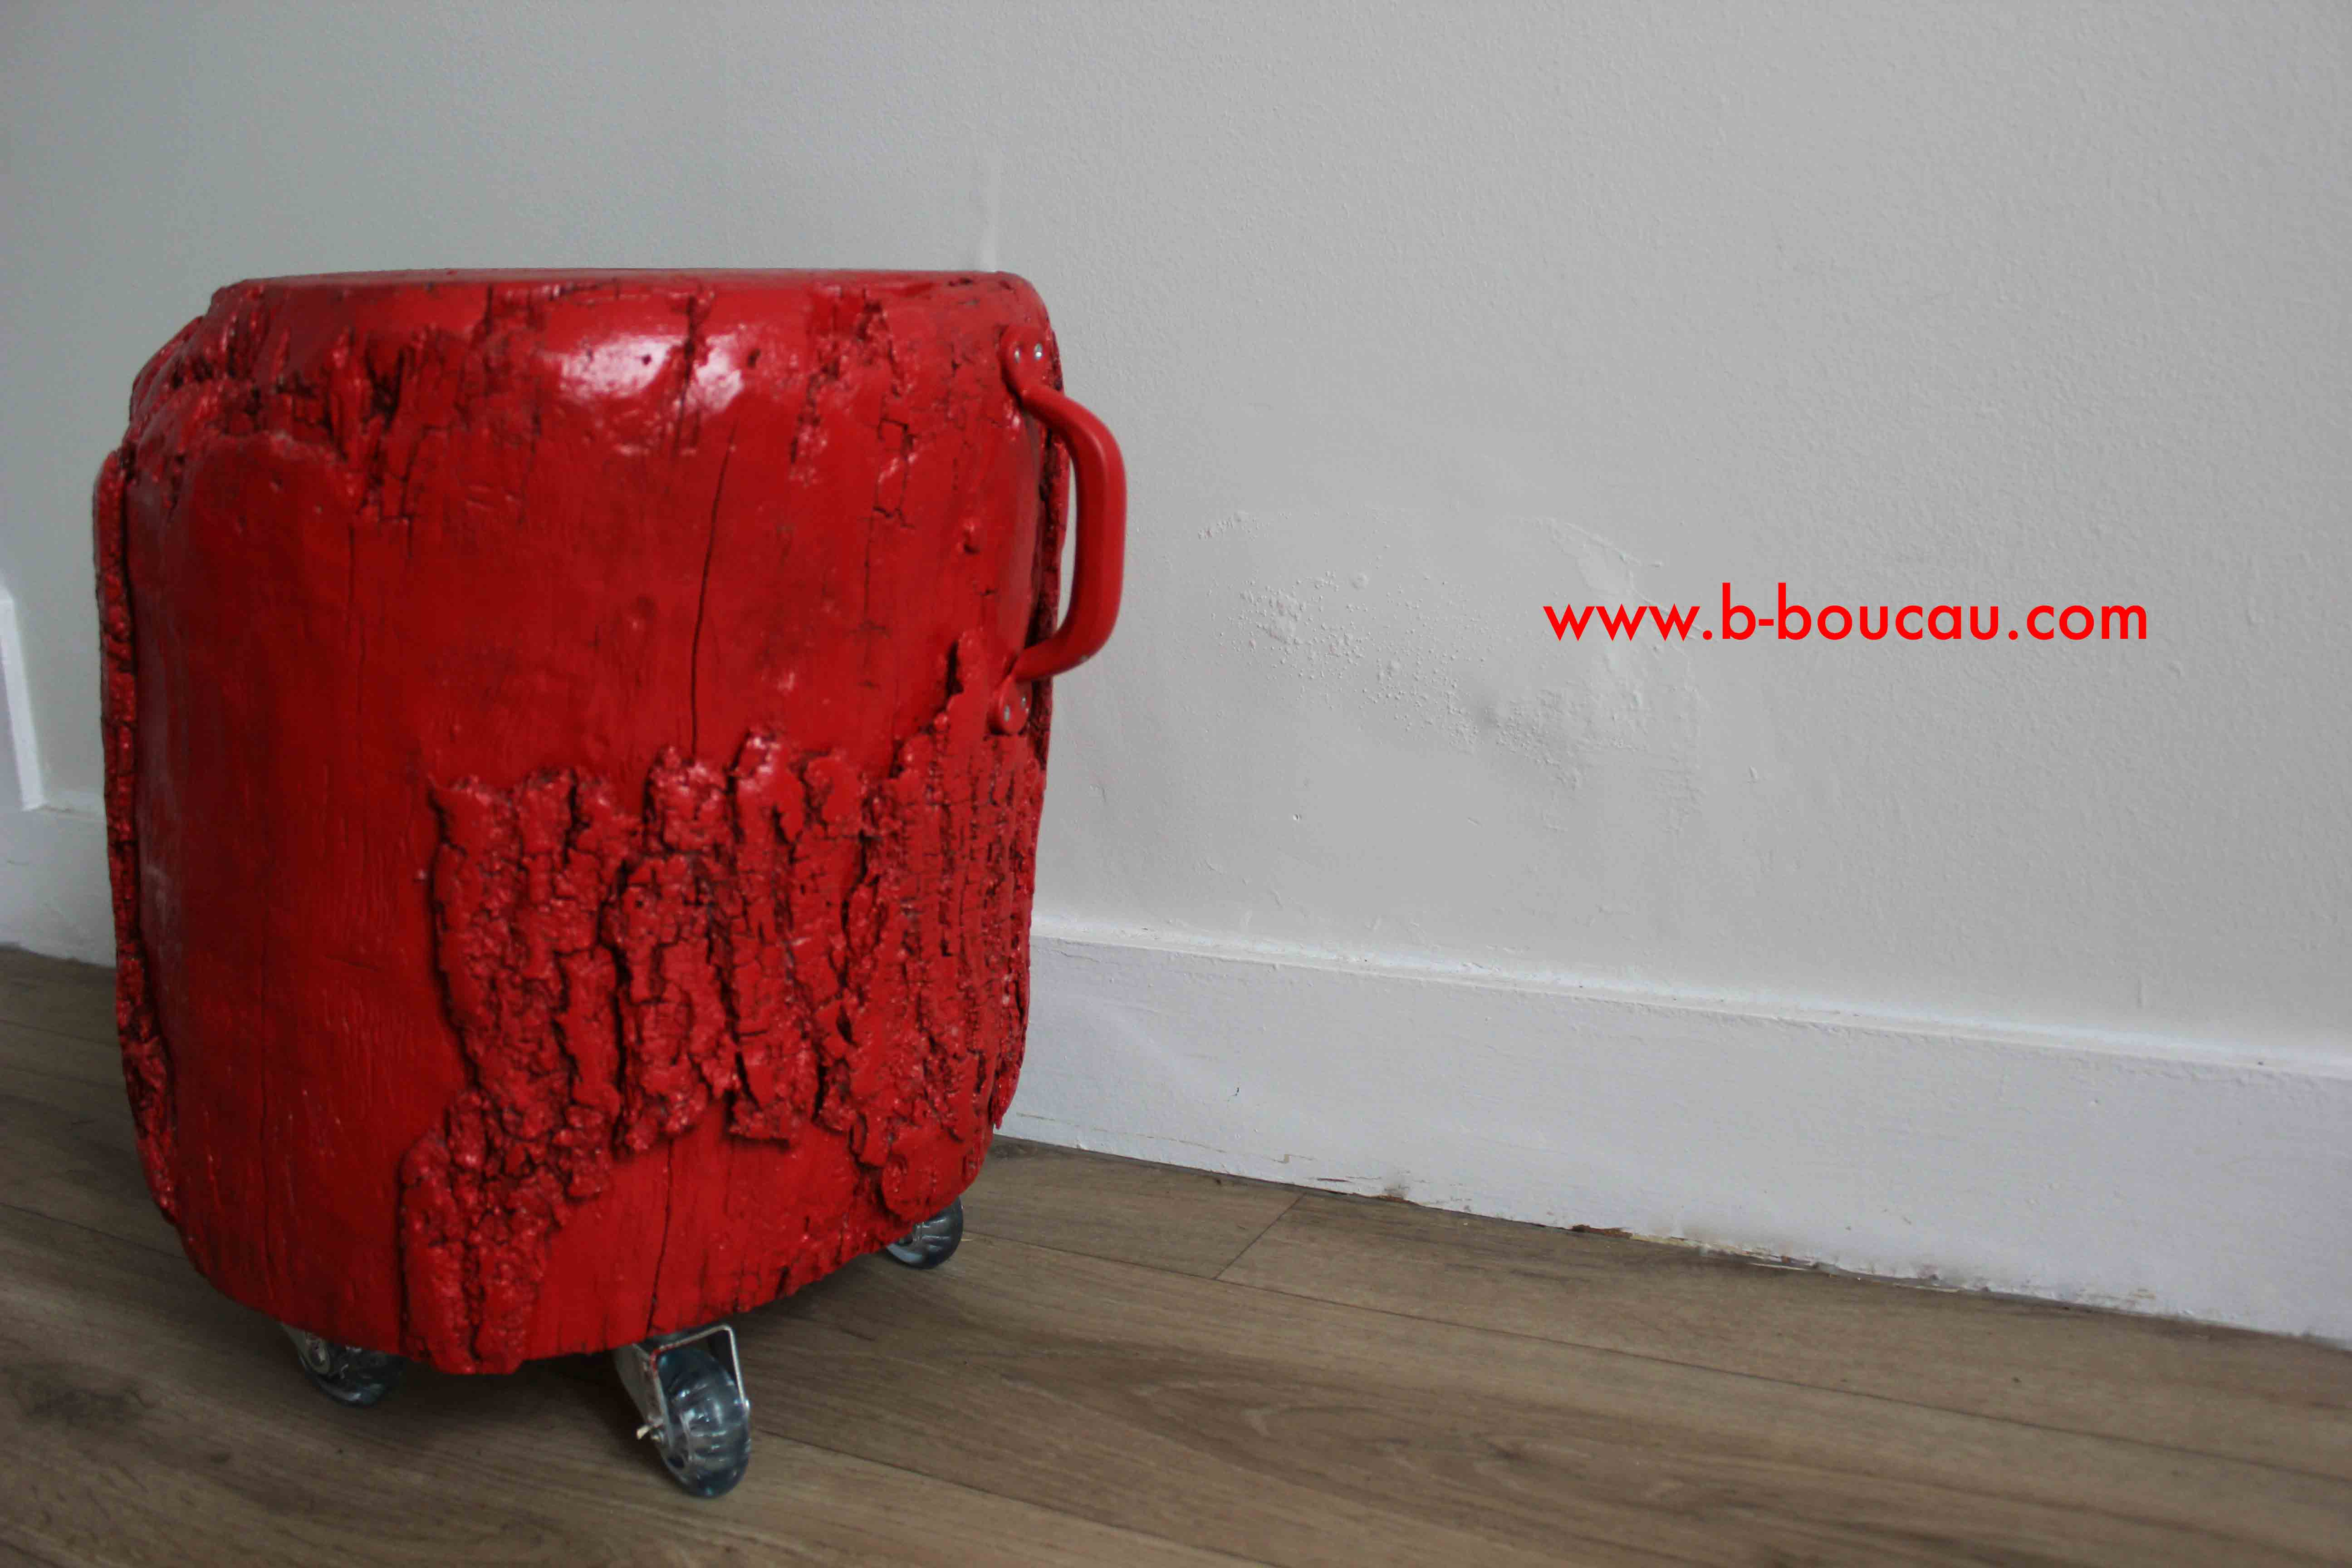 B.Boucau Wood Sit Roulus 2016 1